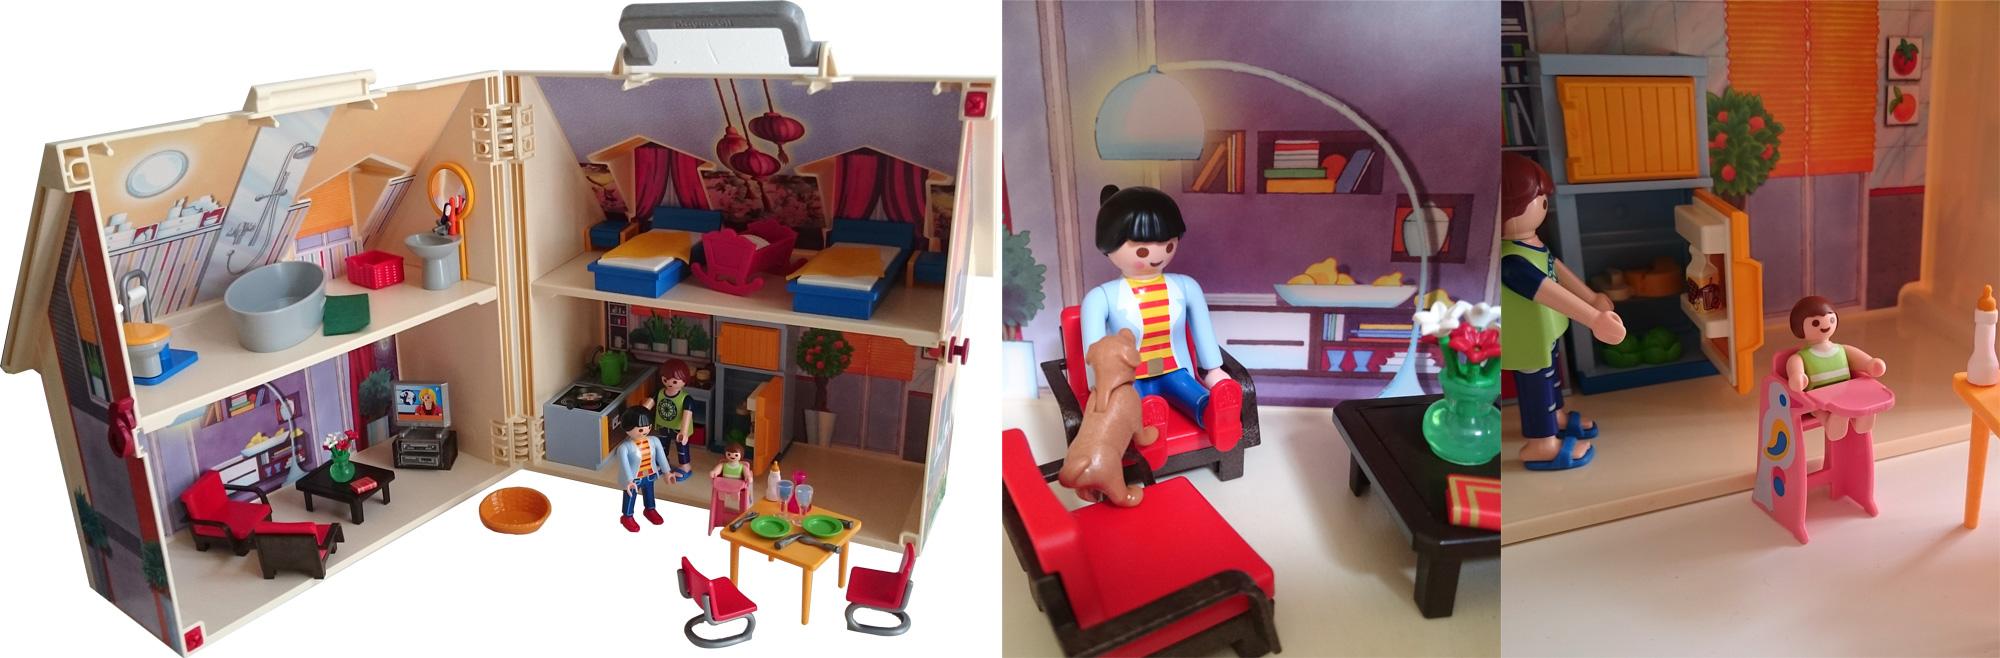 playmobil-maison